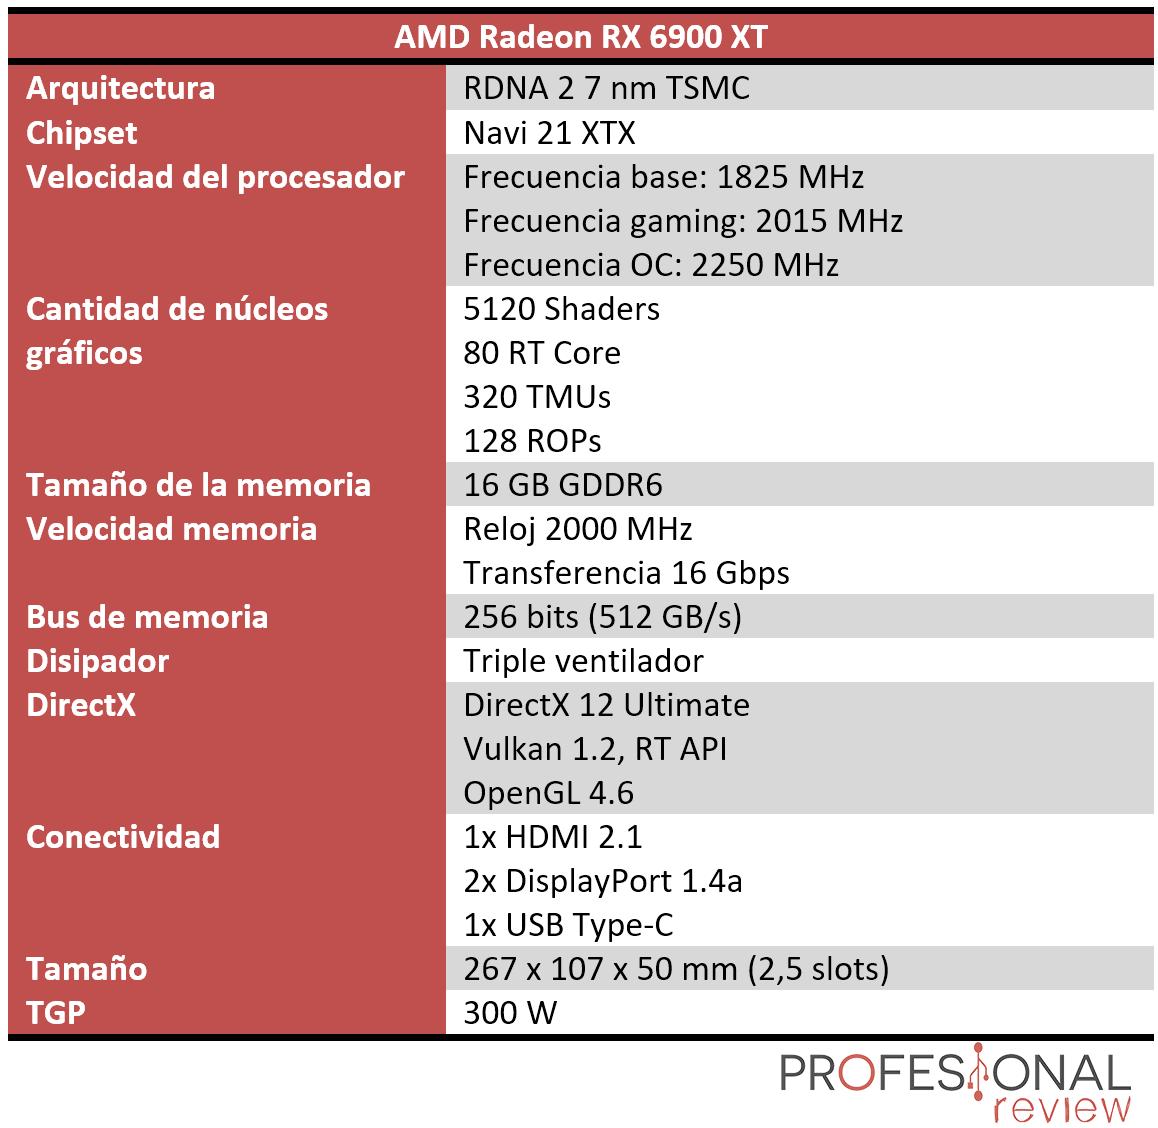 AMD Radeon RX 6900 XT Características